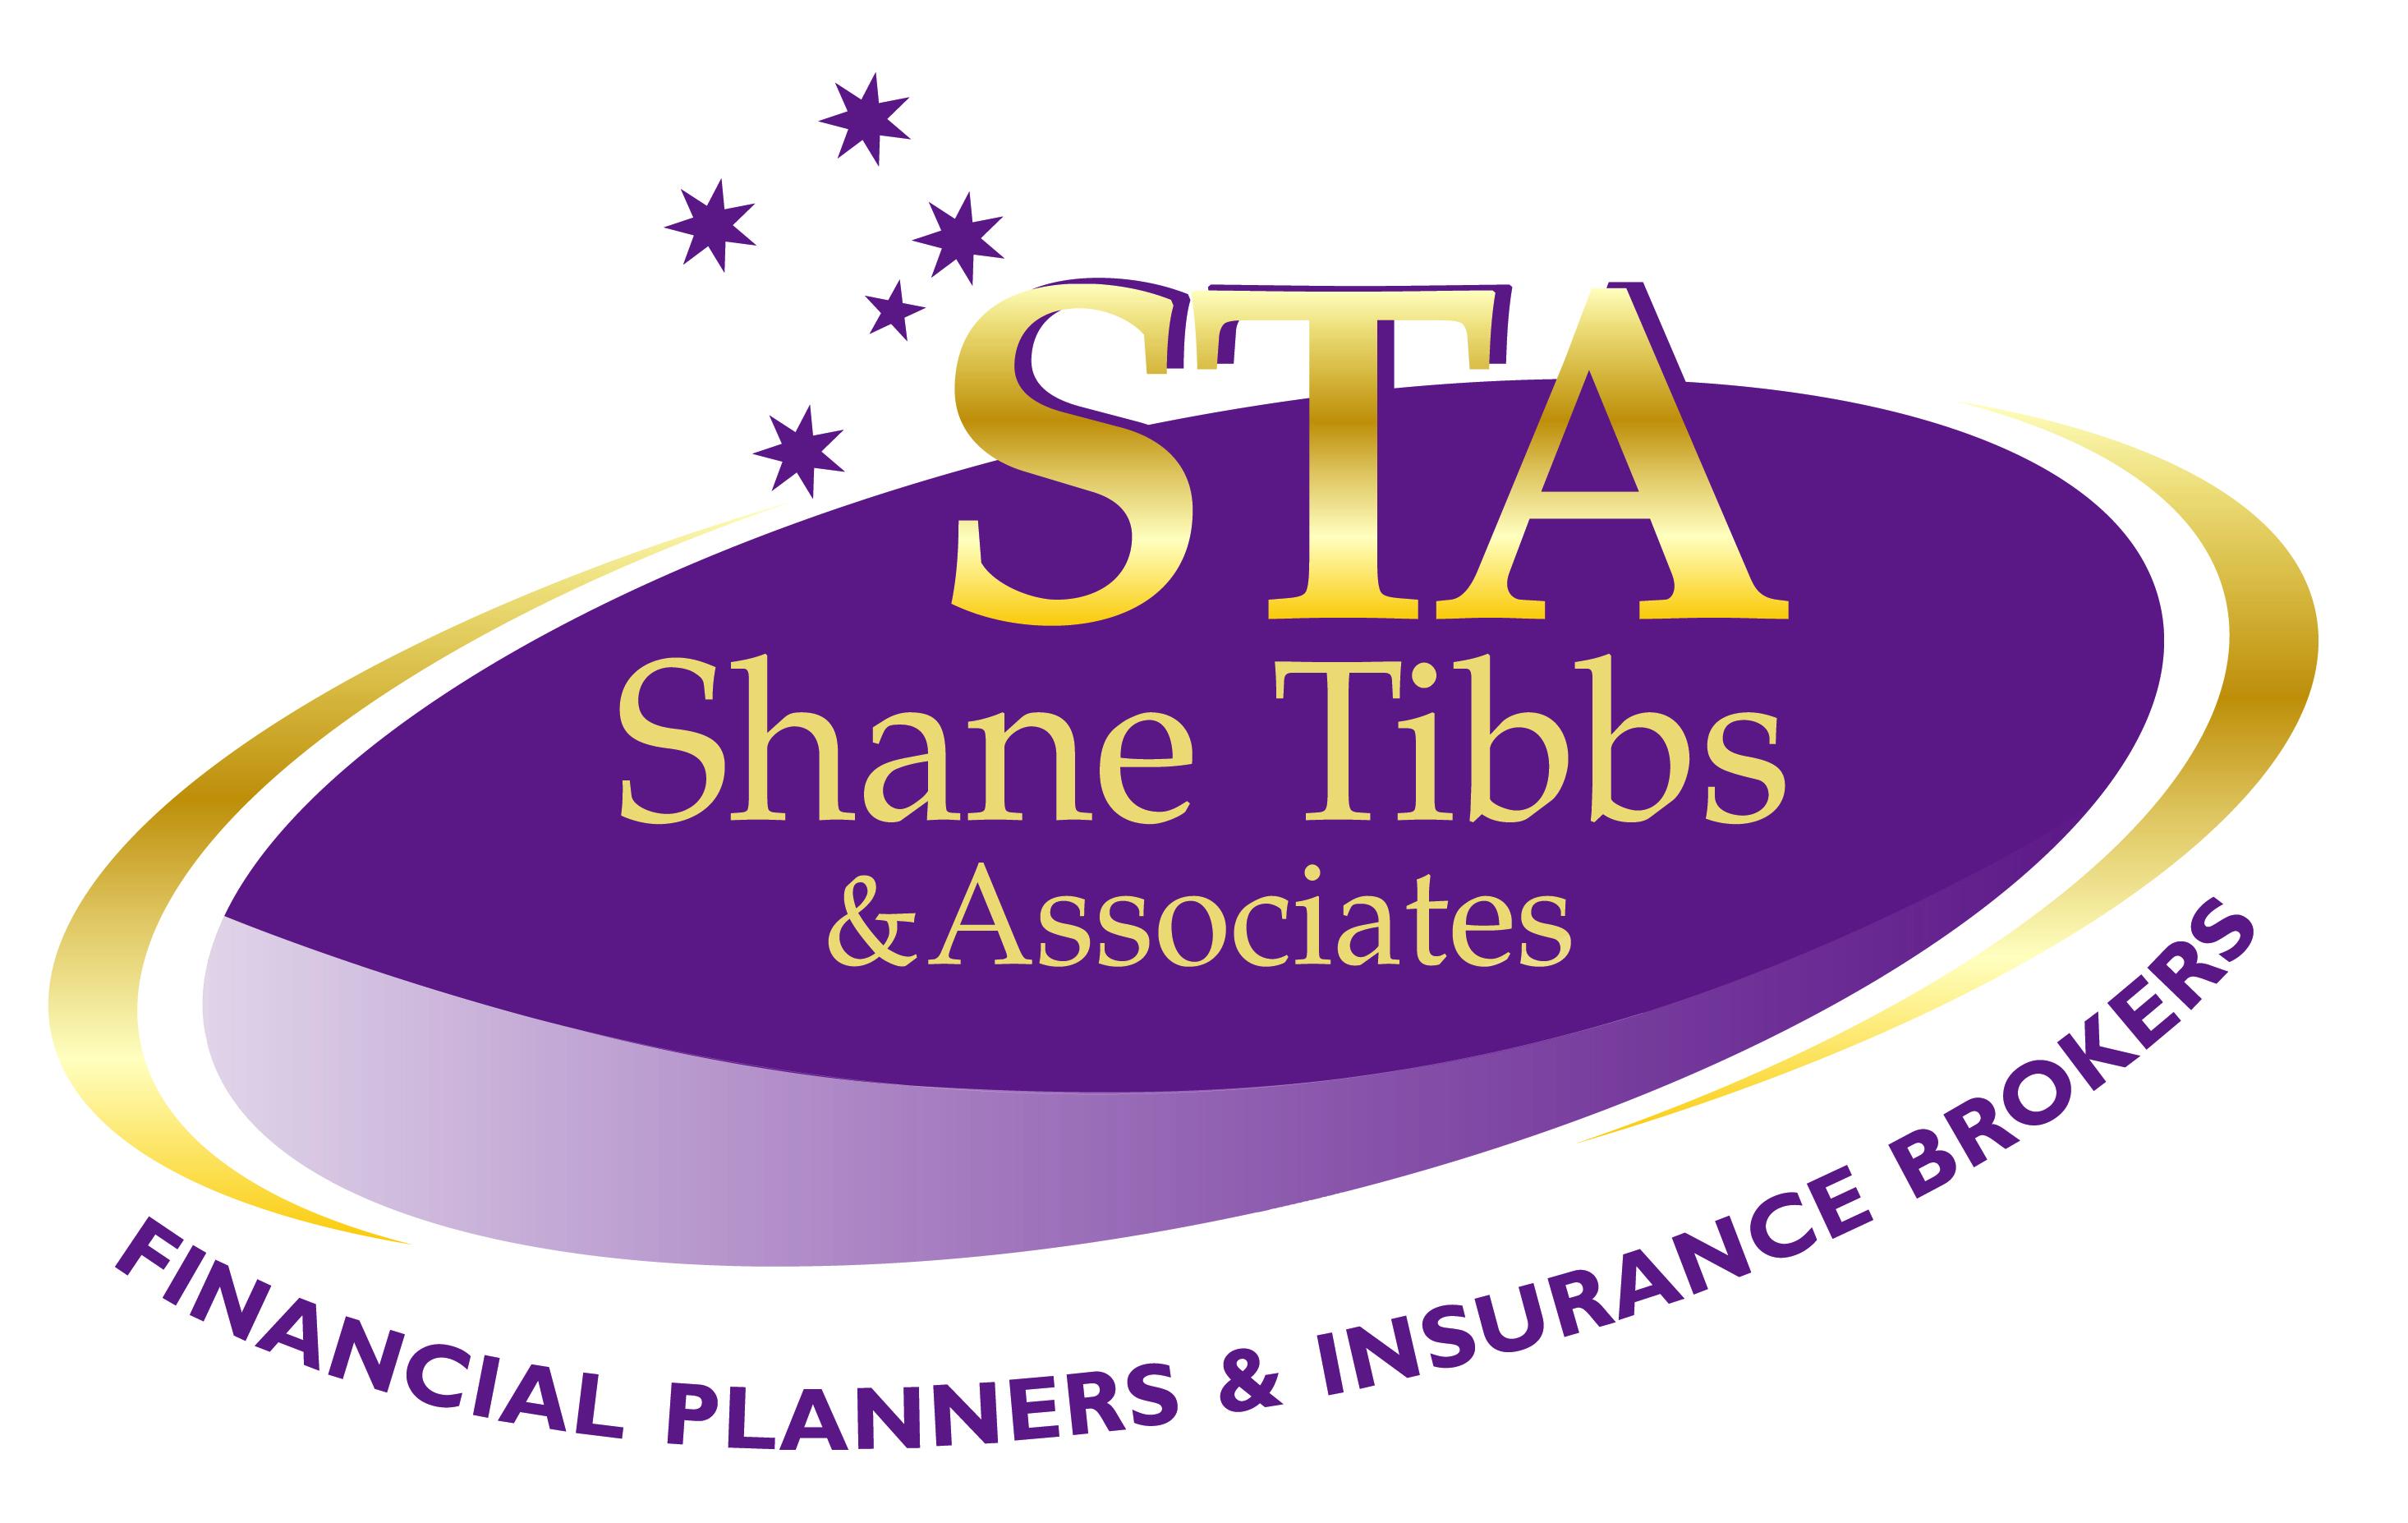 shane-tibbs-and-associates-financial-planners